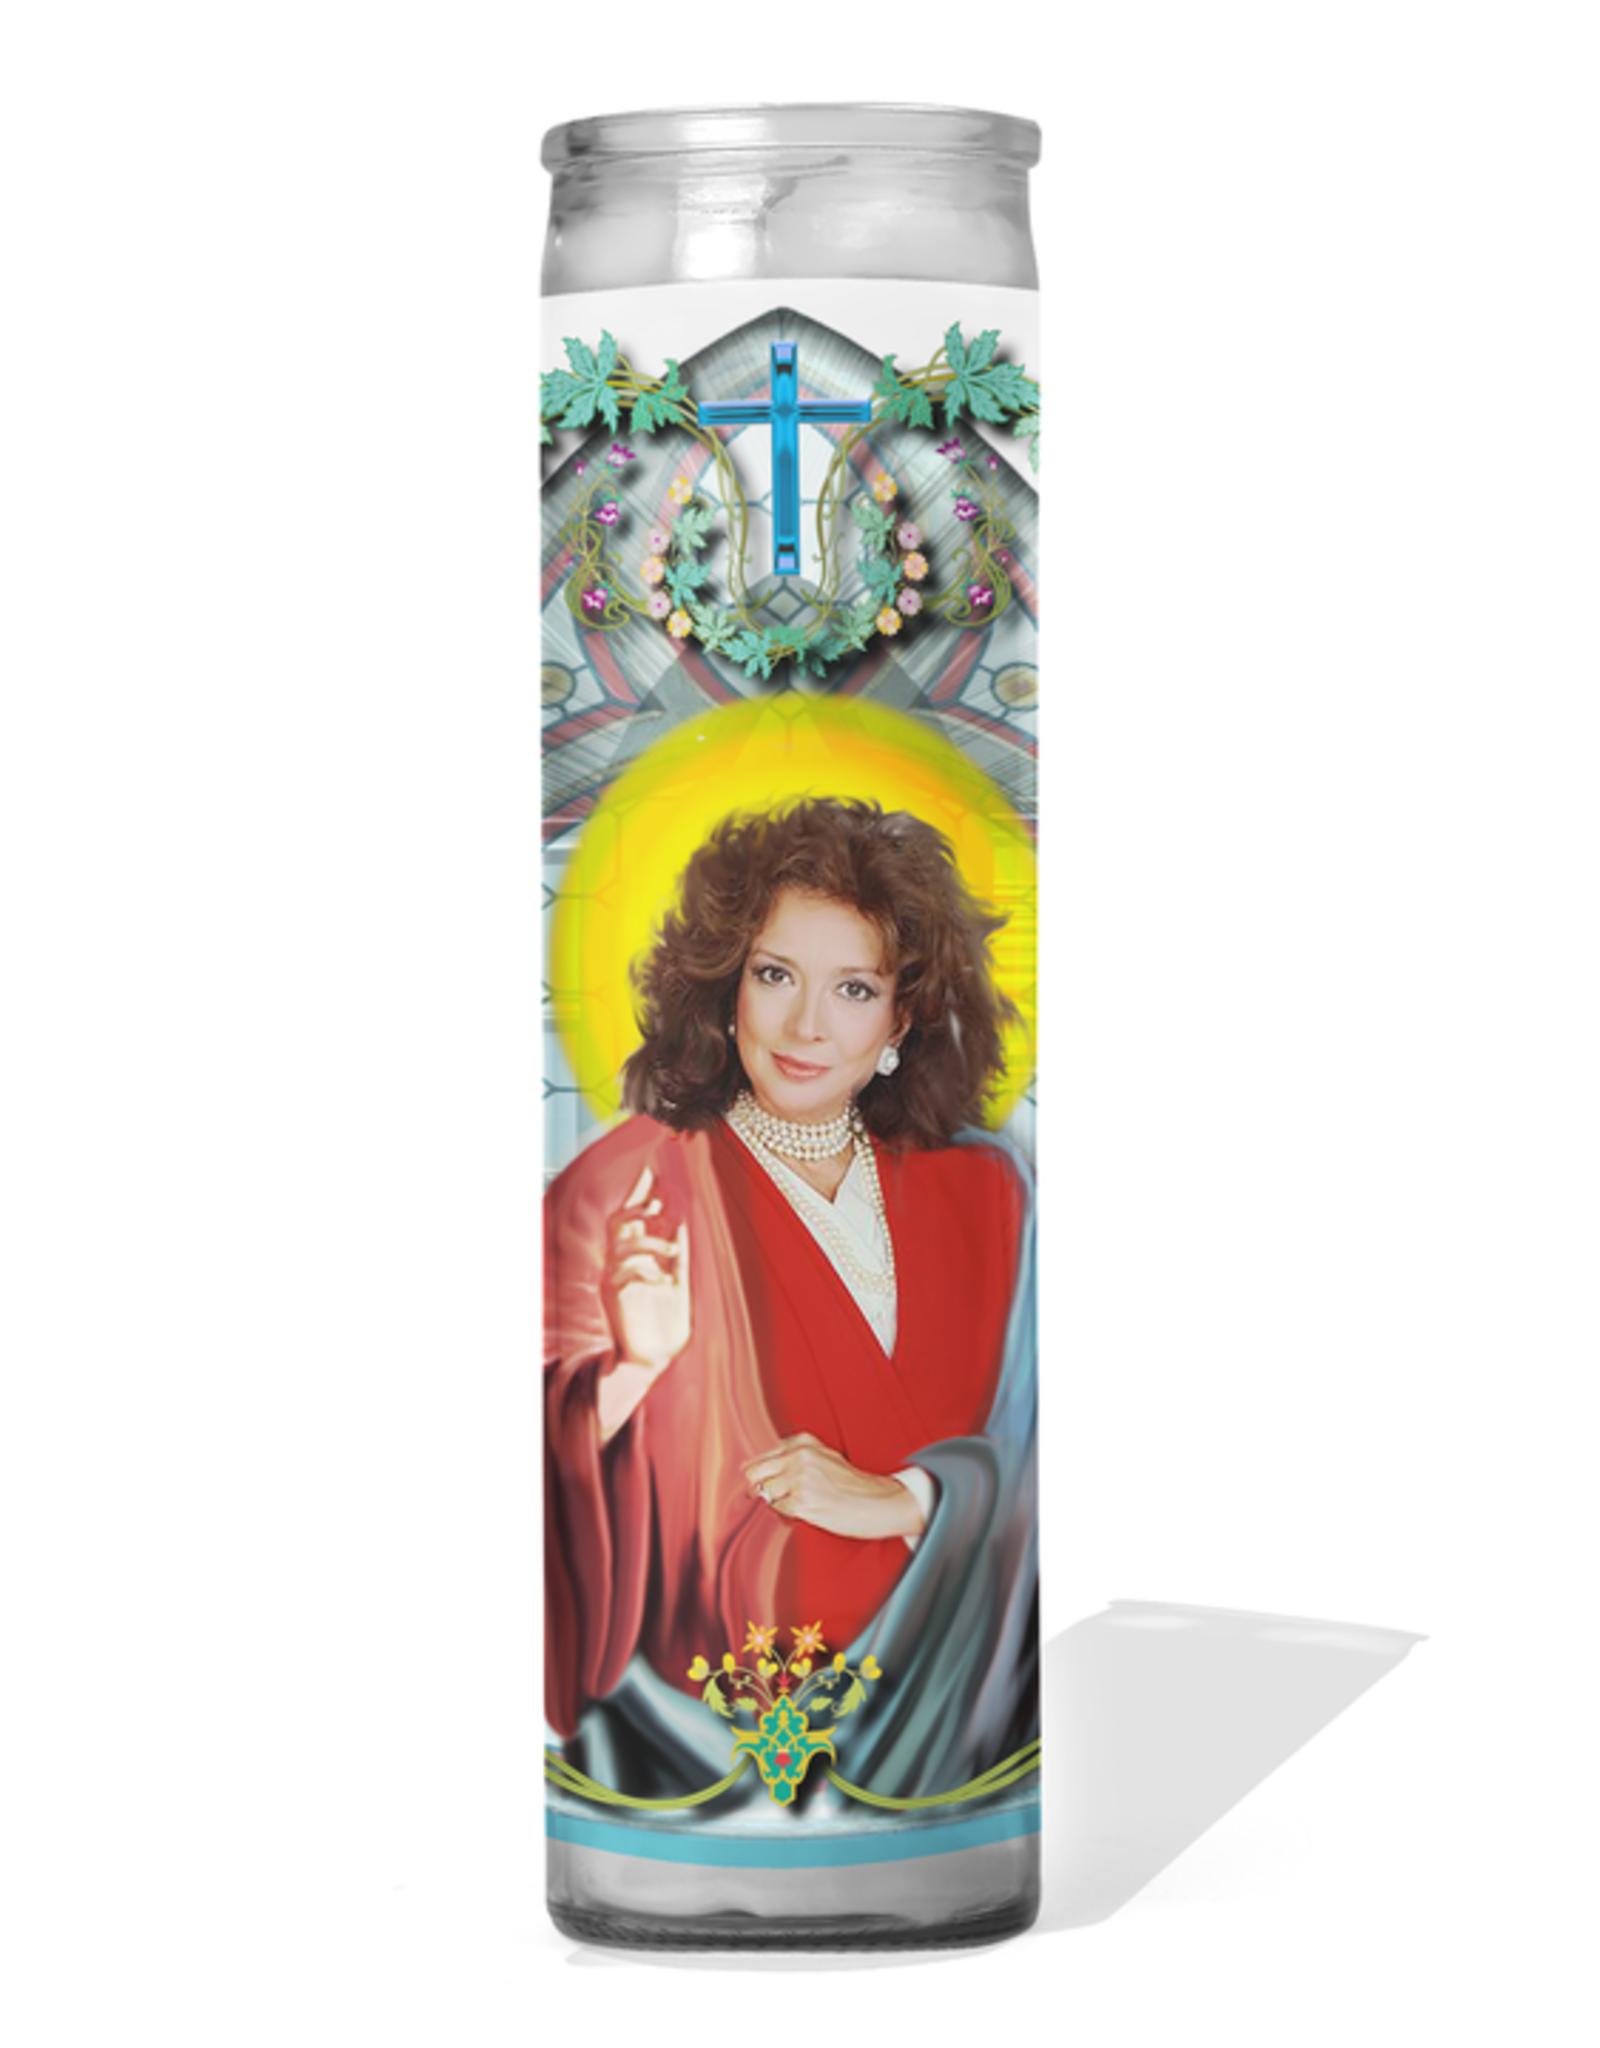 CDC Julia Sugarbaker Celebrity Prayer Candle